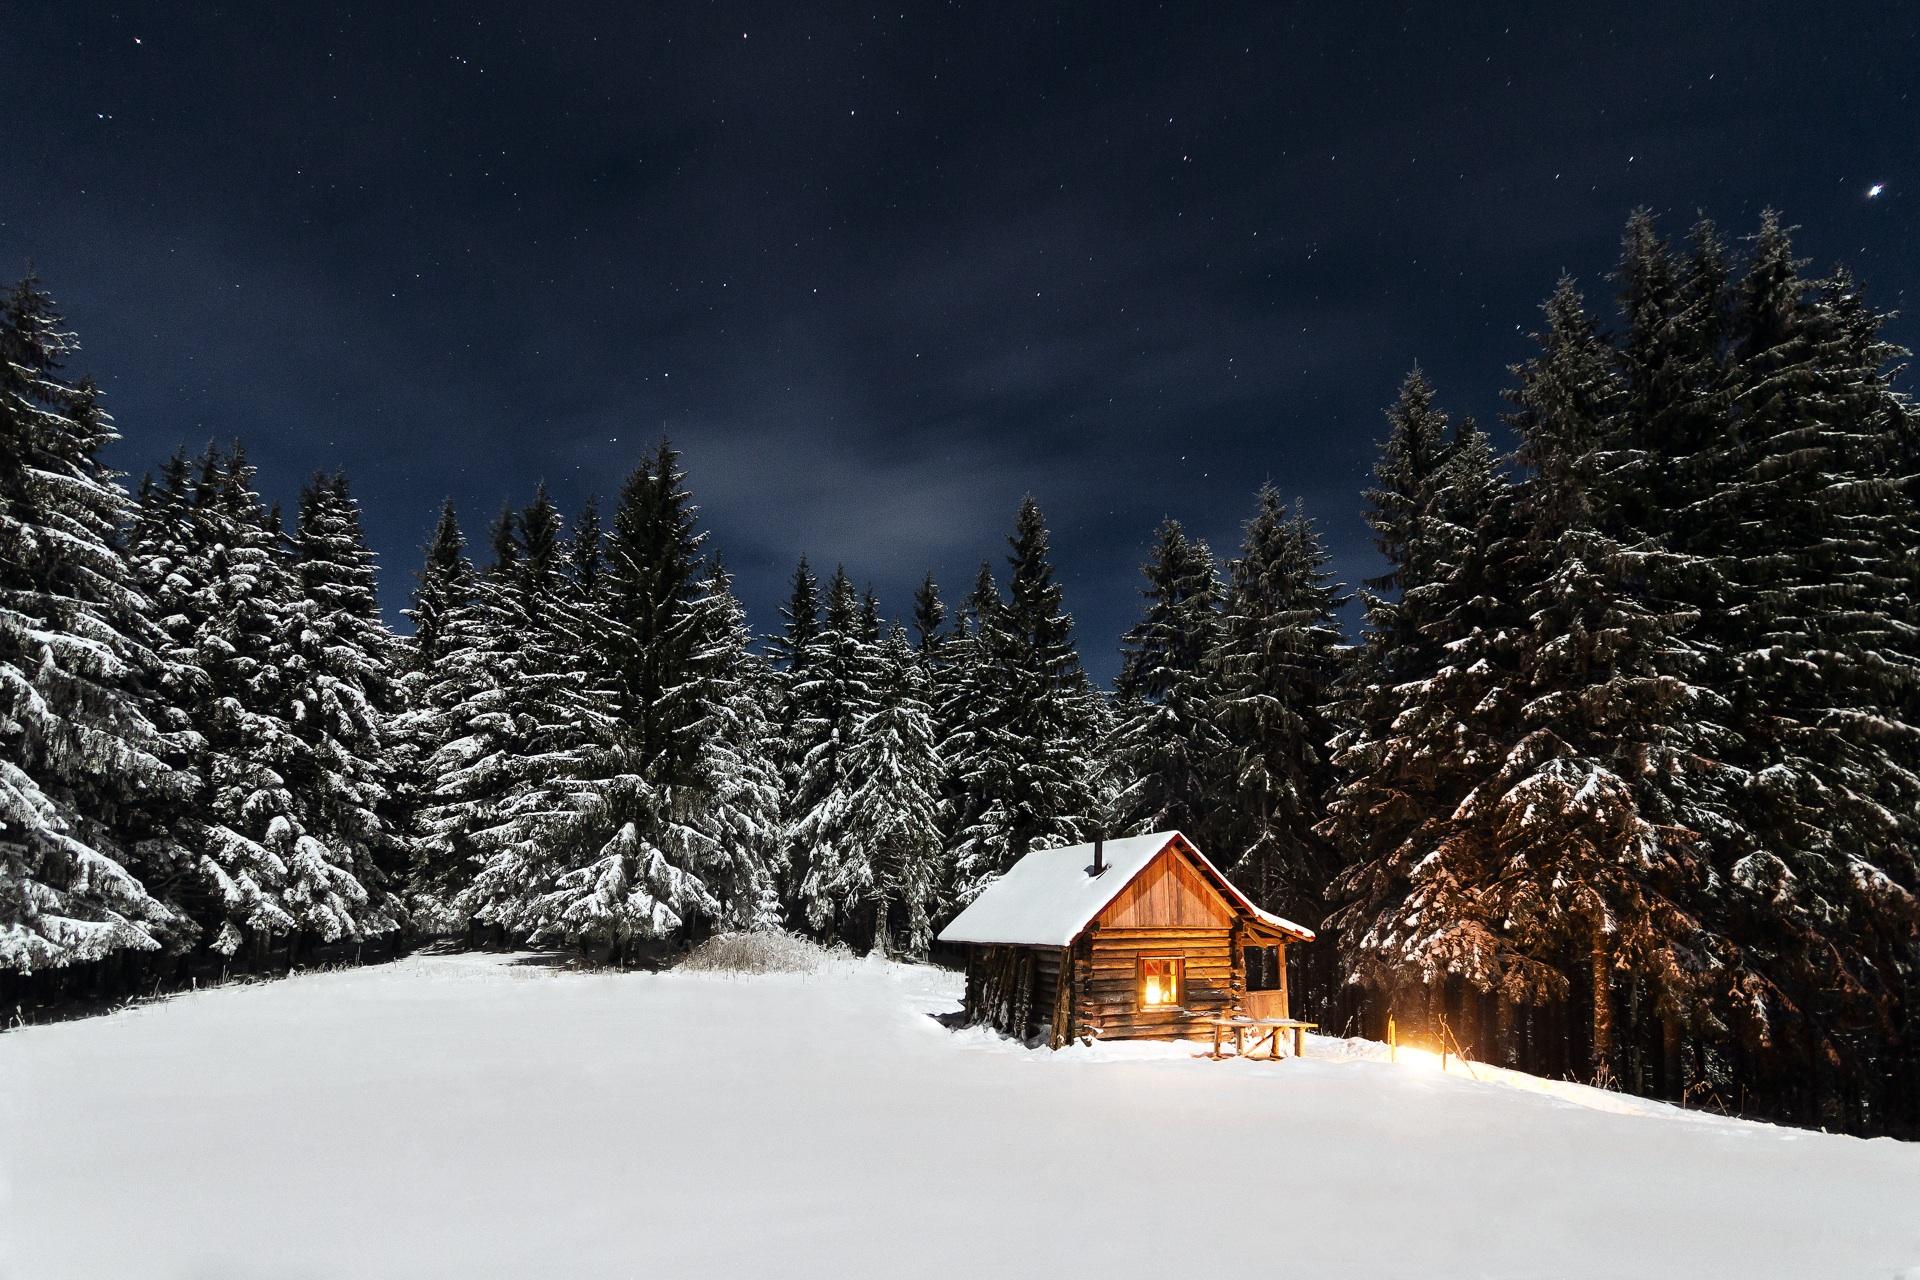 Cozy well lite log cabin in a snowy wood